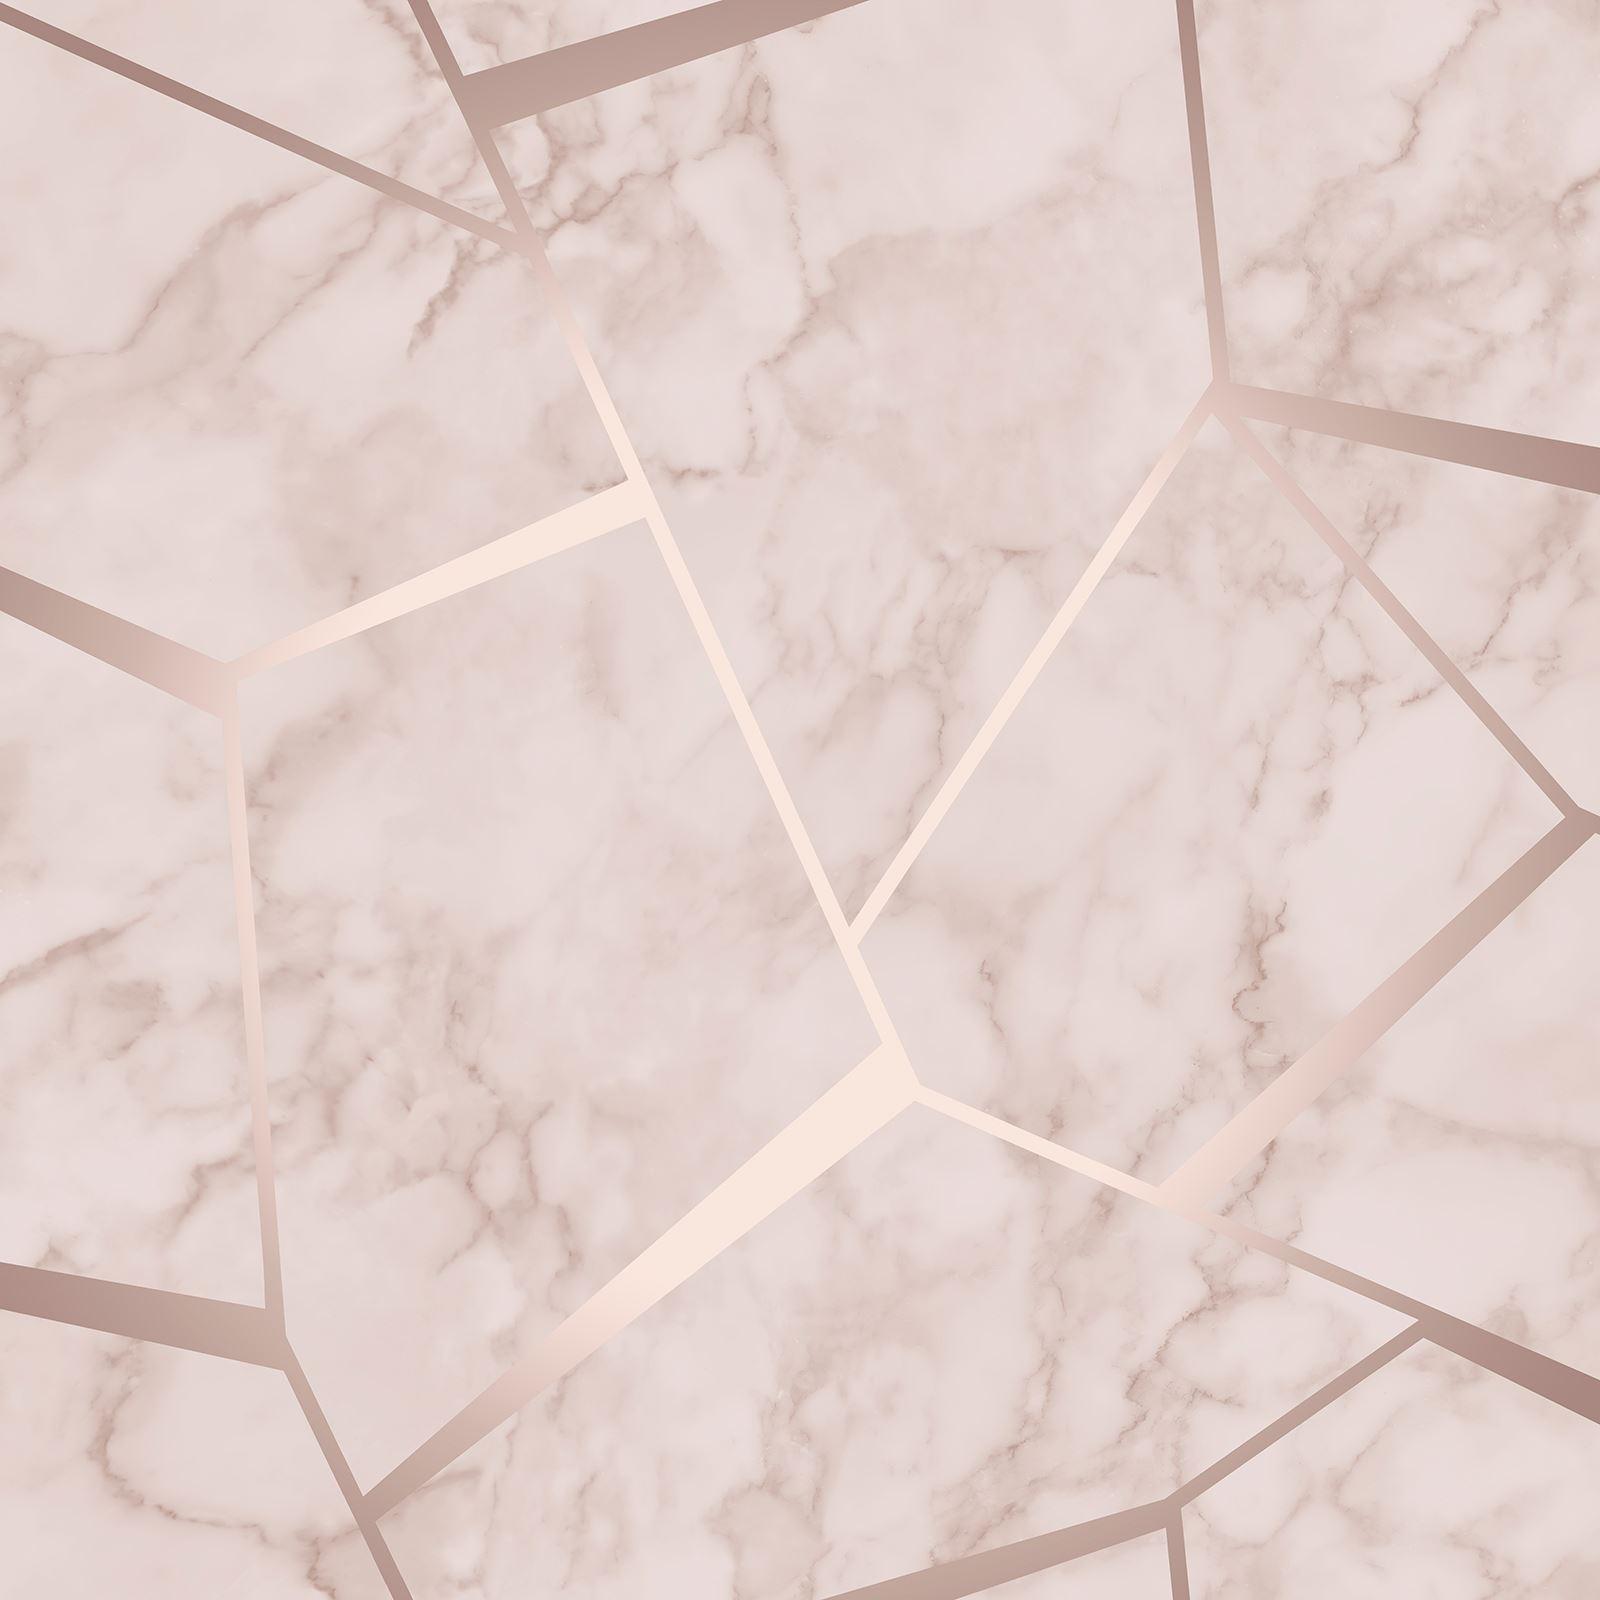 Fantastic Wallpaper Marble Plain - fb94e52b-e370-491f-aa3c-33dd4d17e5a9  Pictures_904716.jpg